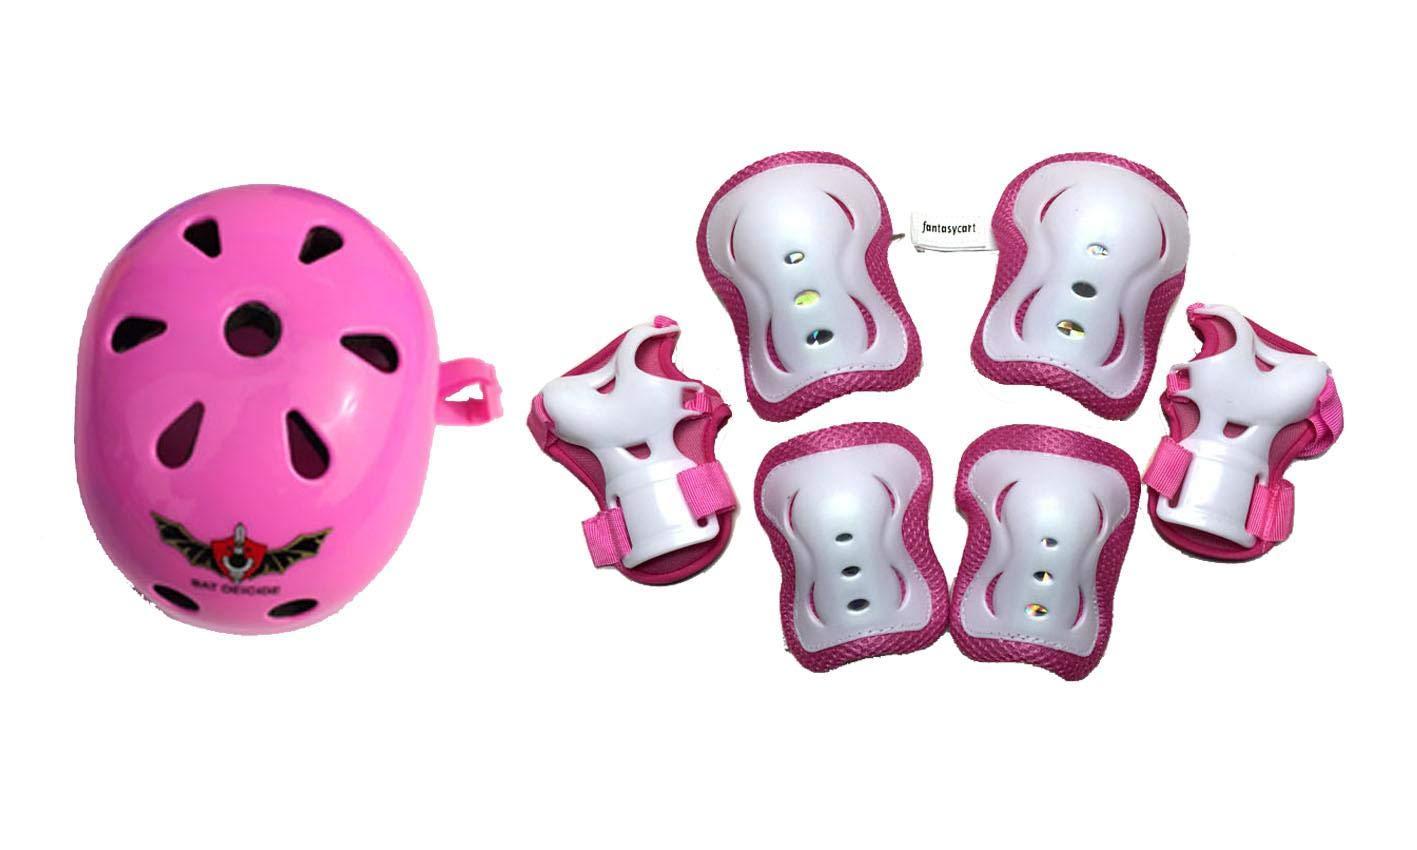 Fantasycart Kid's Skateboard Longboard Helmet Knee & Elbow Pads Wrist Guard Combo Pink Set 2-8 years old by Fantasycart's